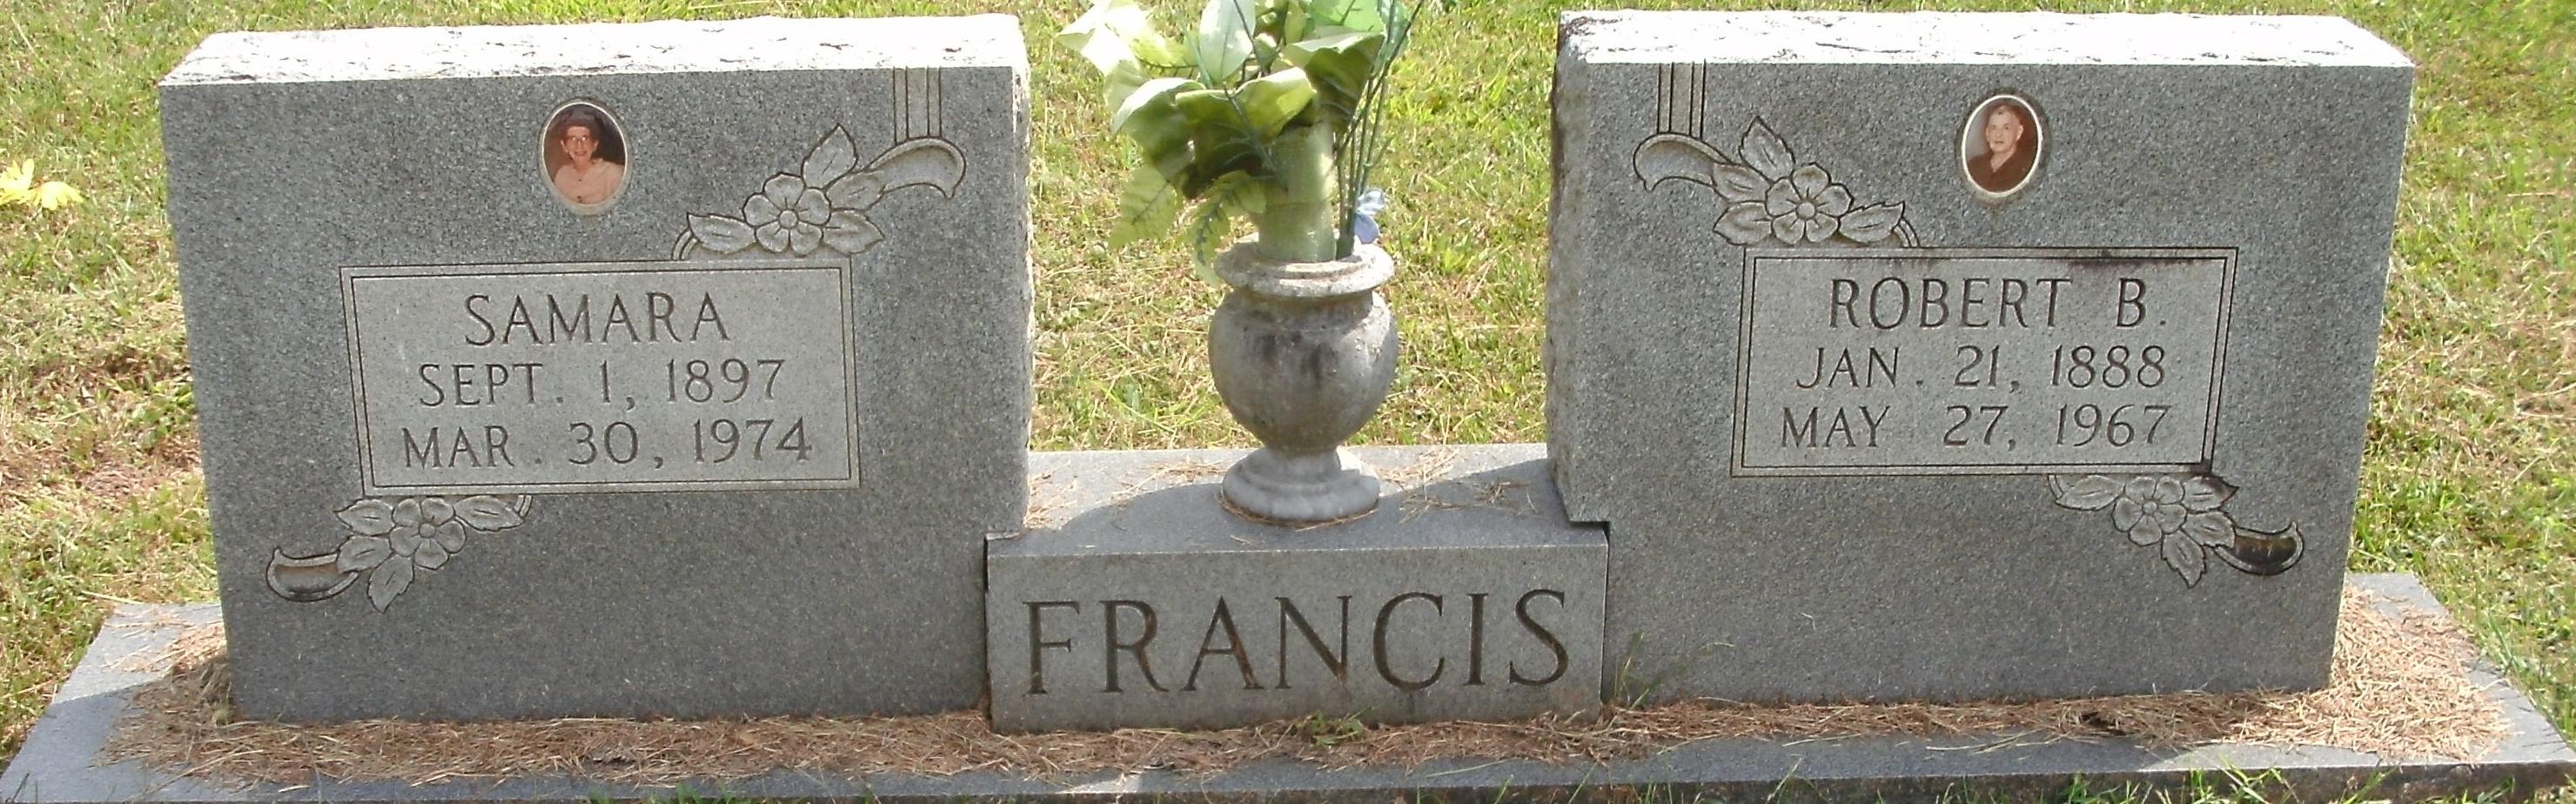 Robert Blackburn Francis